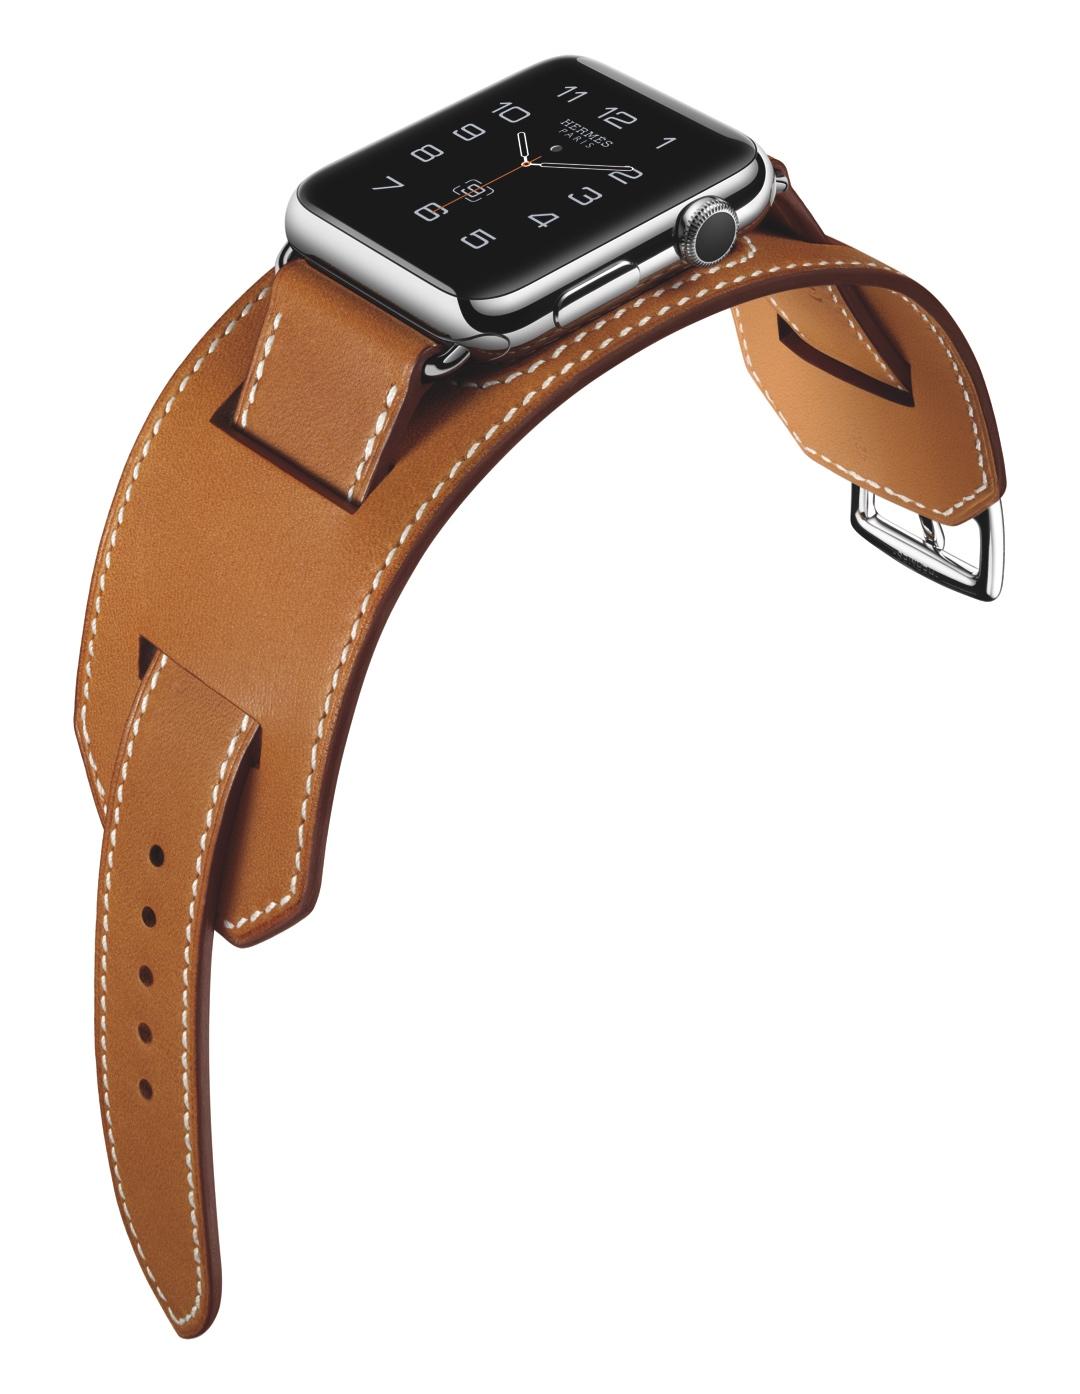 Apple-Watch-Hermes-Cuff.jpg